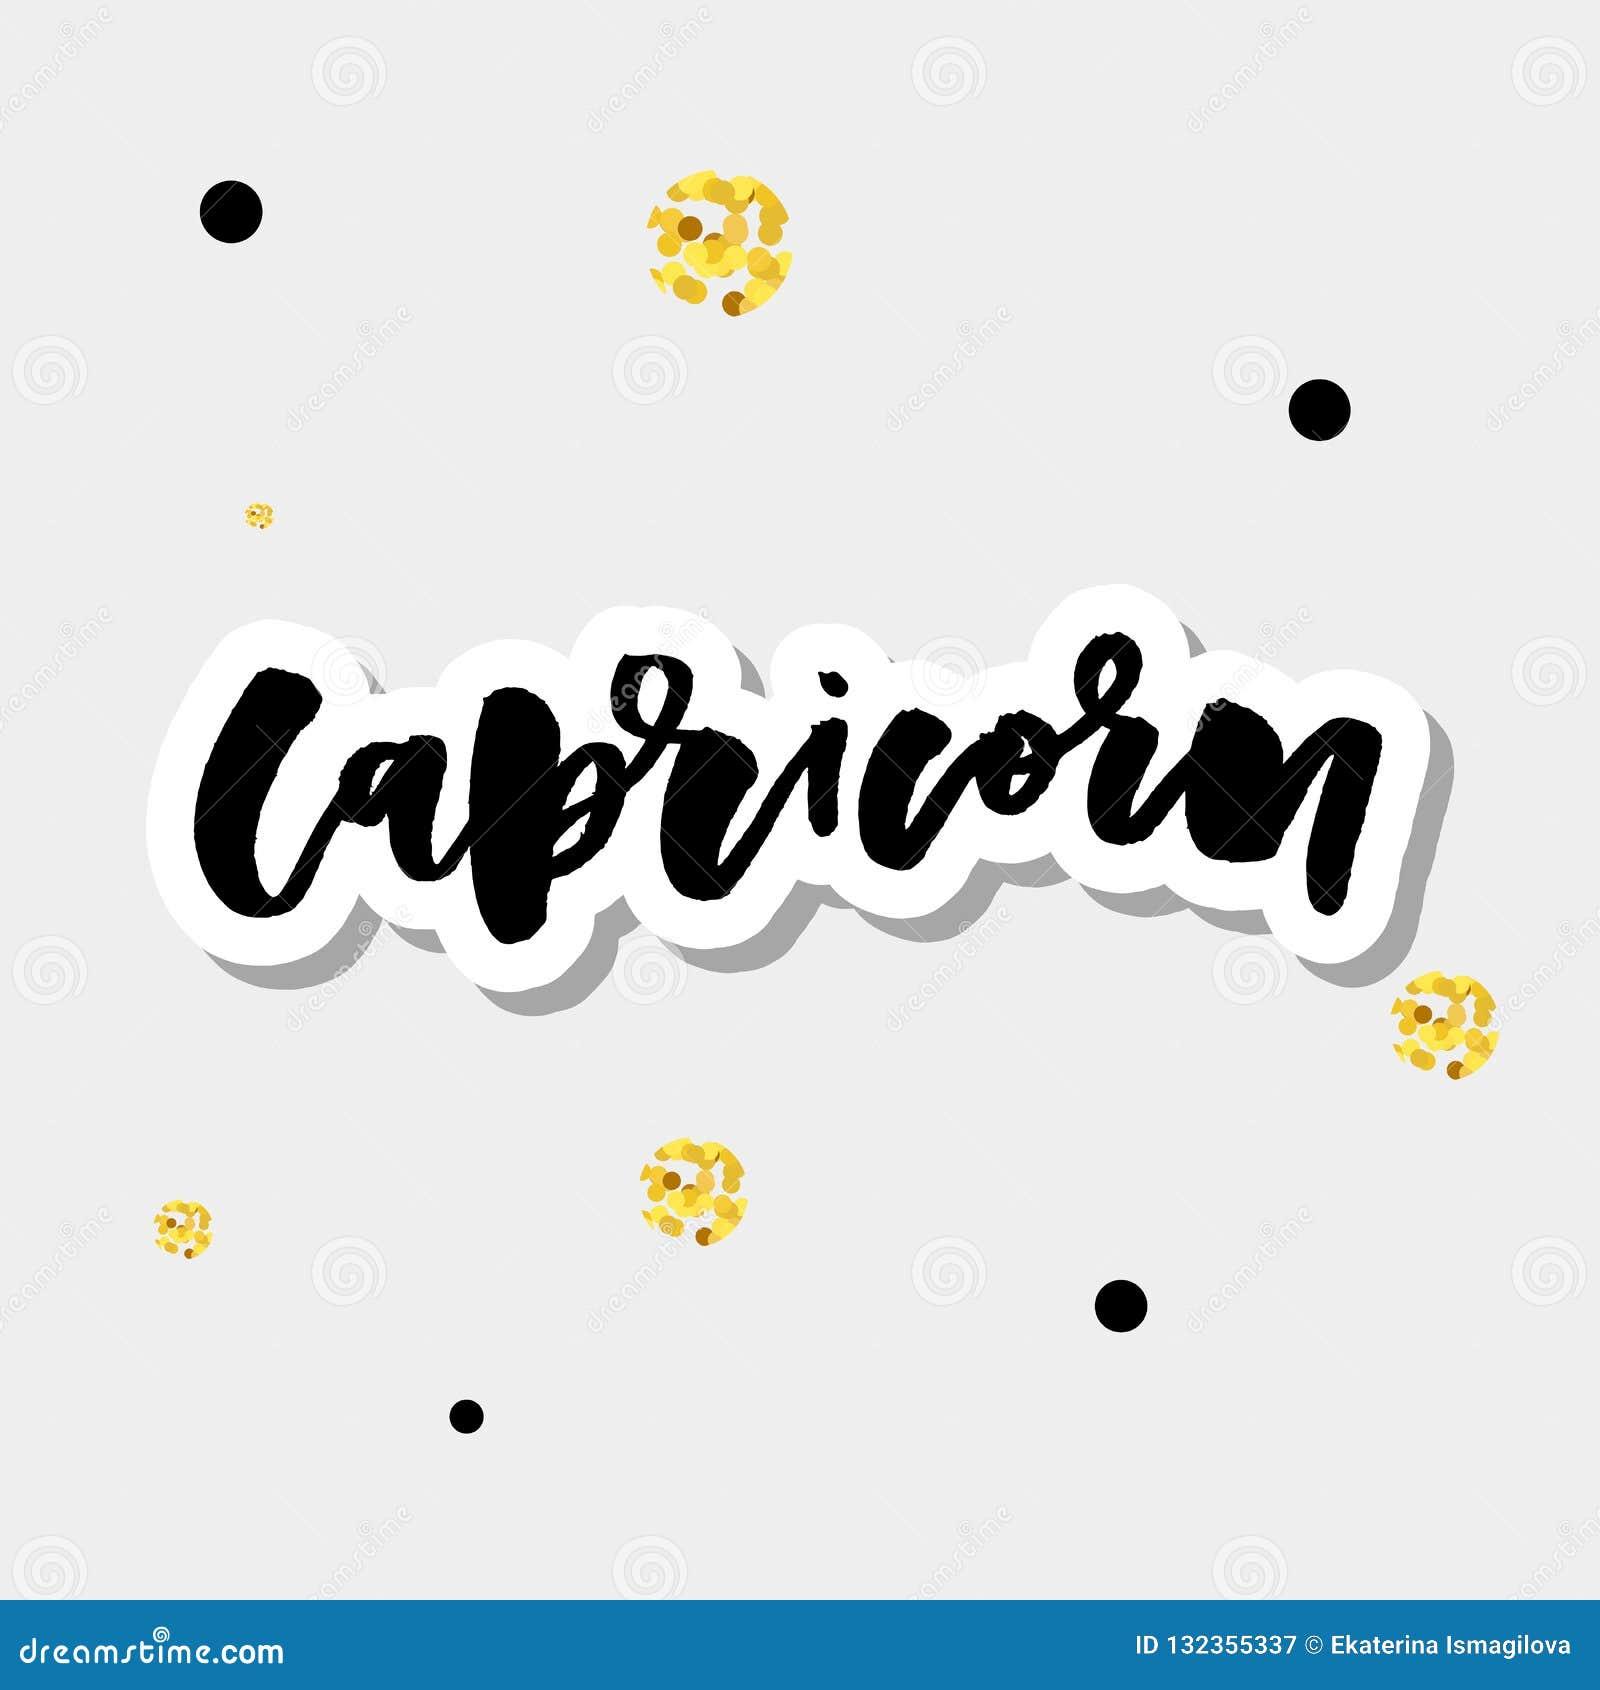 Capricorn lettering Calligraphy Brush Text horoscope Zodiac sign illustration